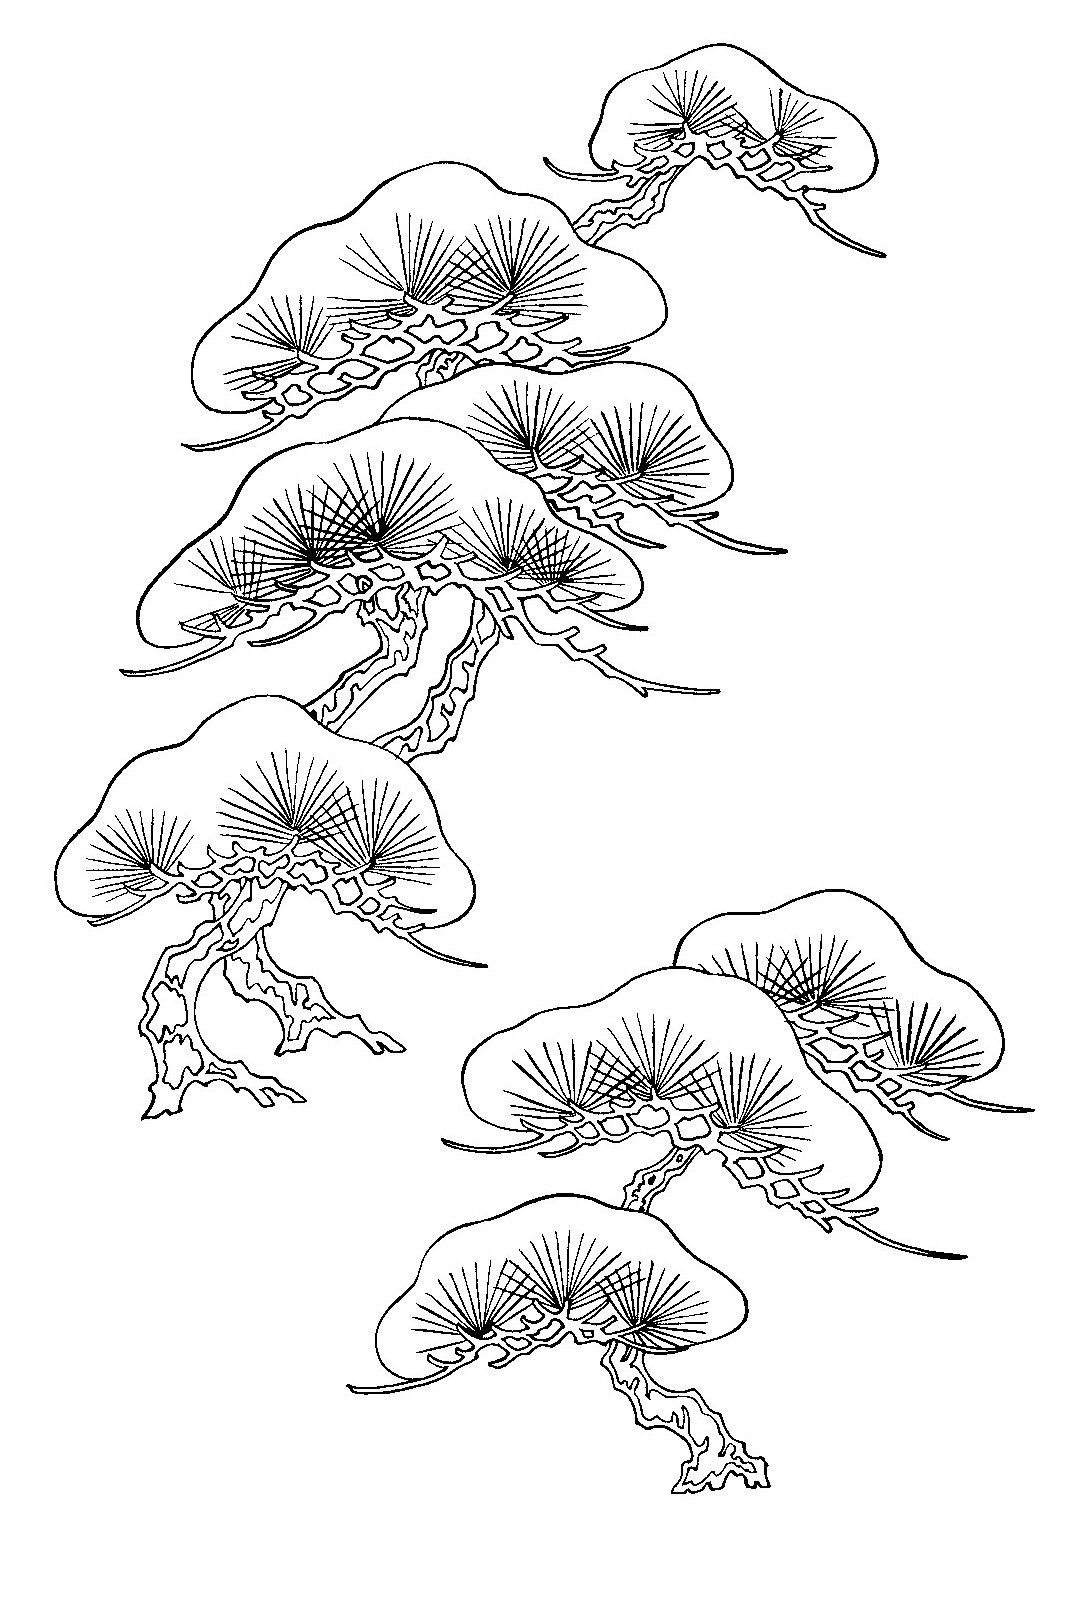 d8fee0d94 Japanese pine tree (matsu) design   Design in 2019   Japanese tree ...